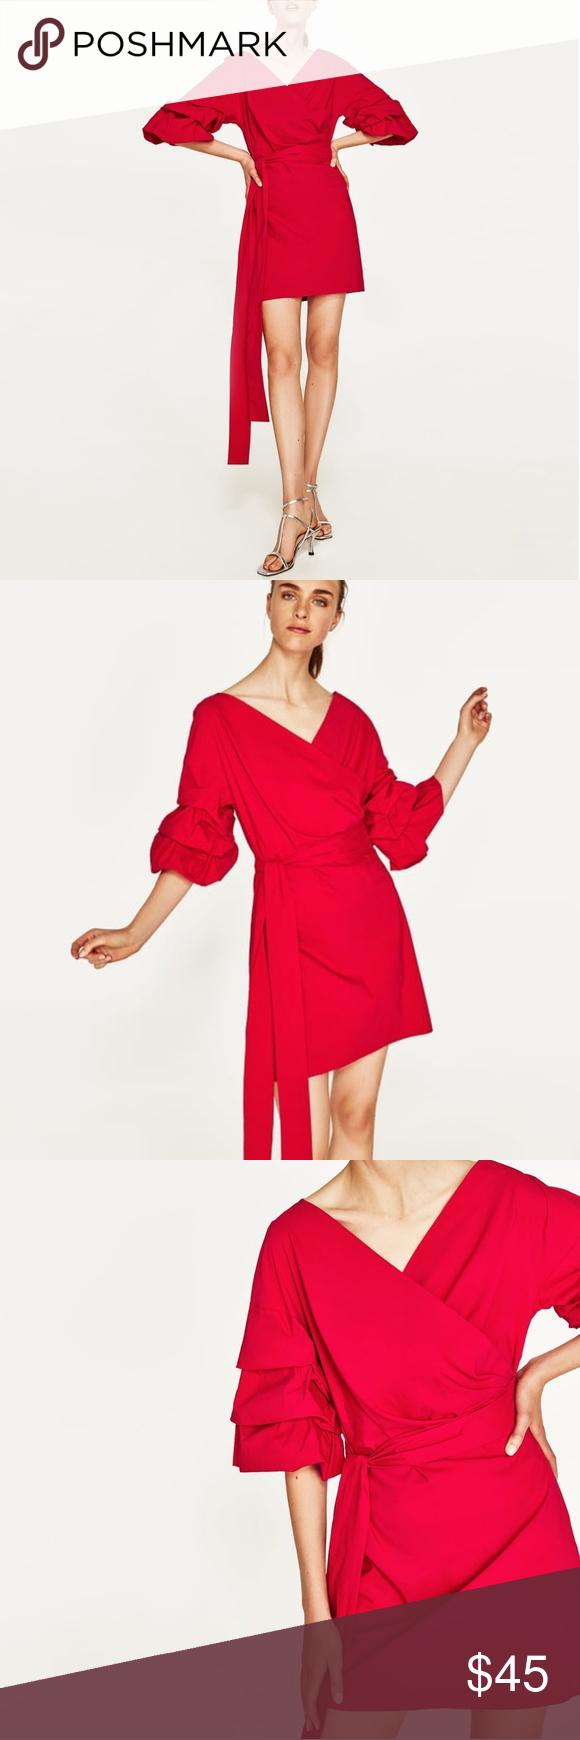 Zara red dress with ruffled sleeves xs nwt pinterest